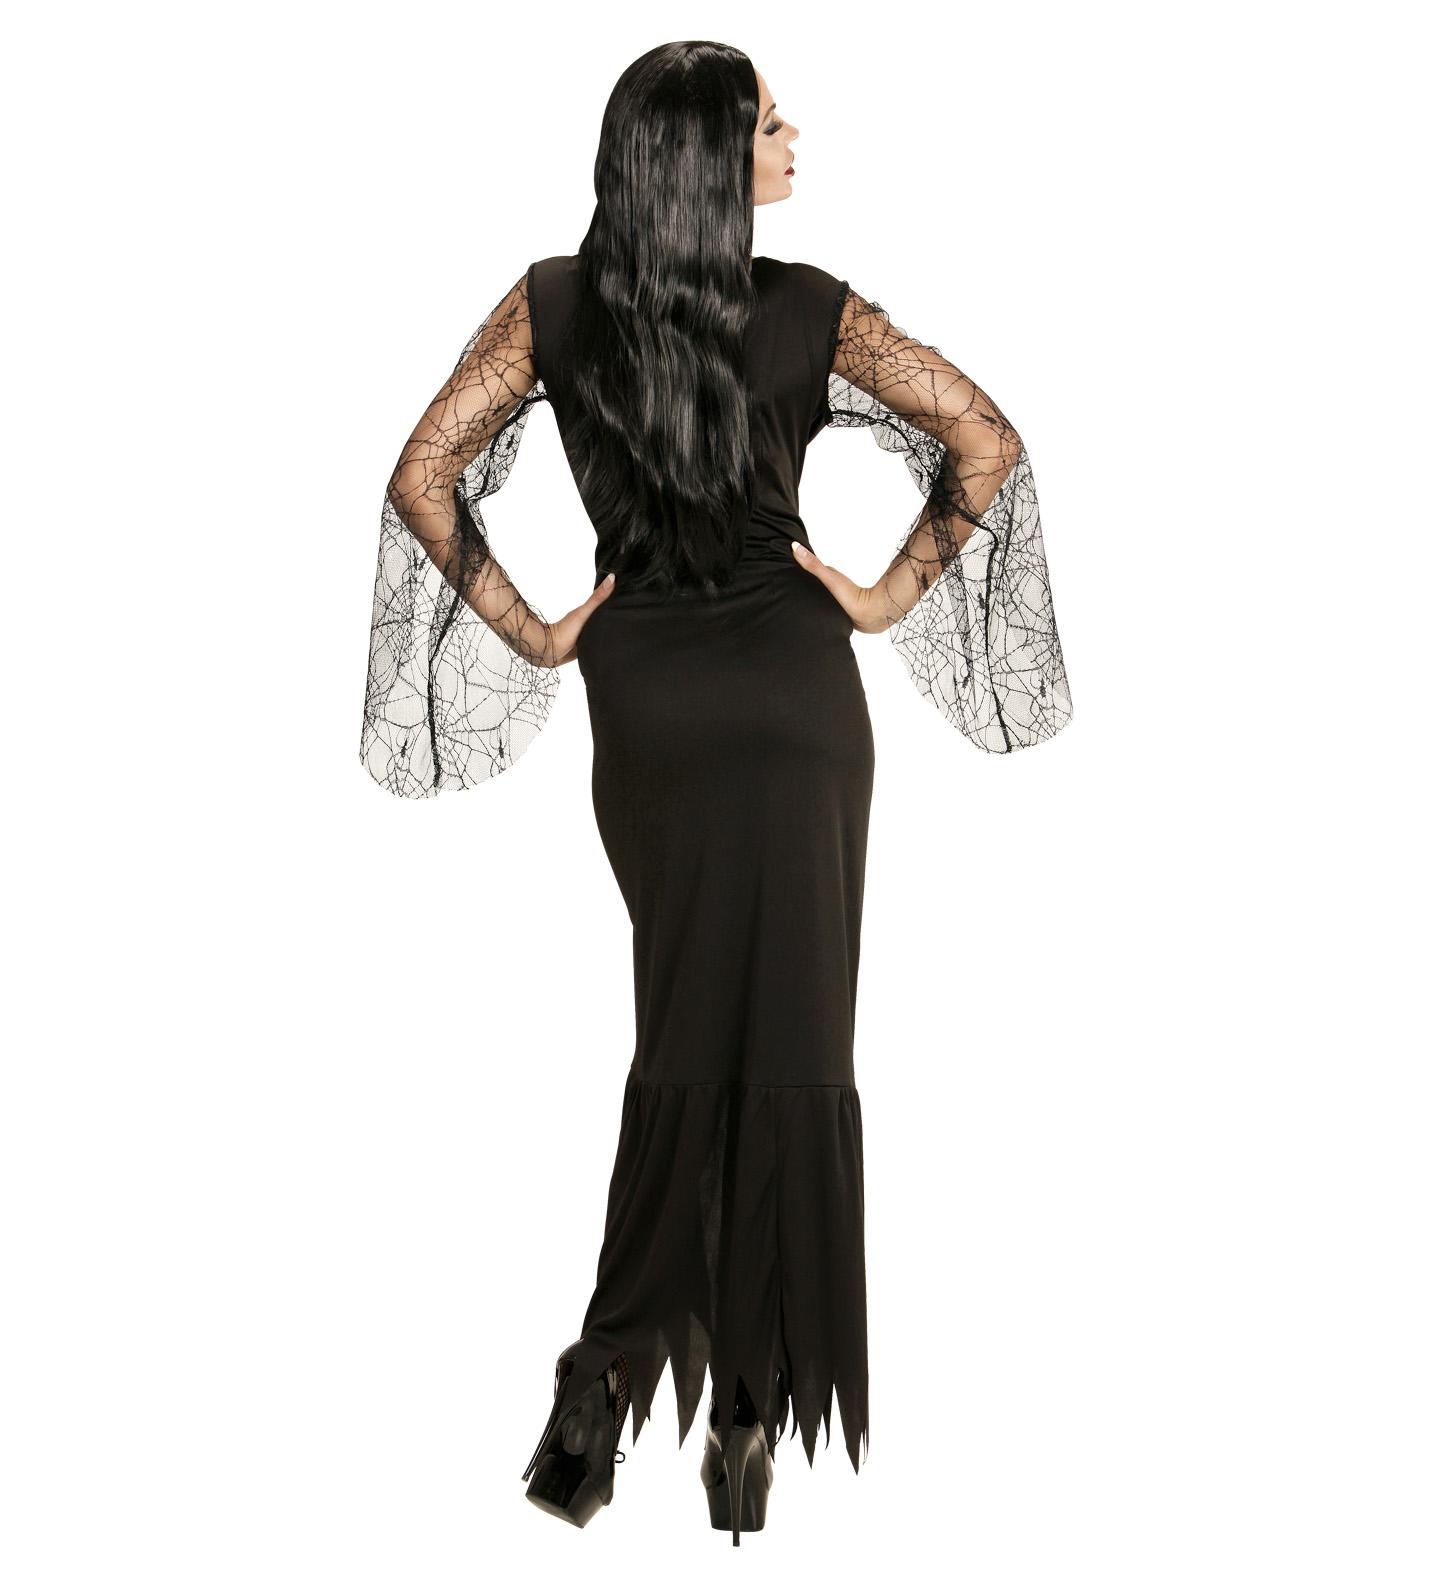 Halloween Kostüm Damen Skelett Luxus La S Mortisia Costume for Halloween Fancy Dress Cosplay Ou